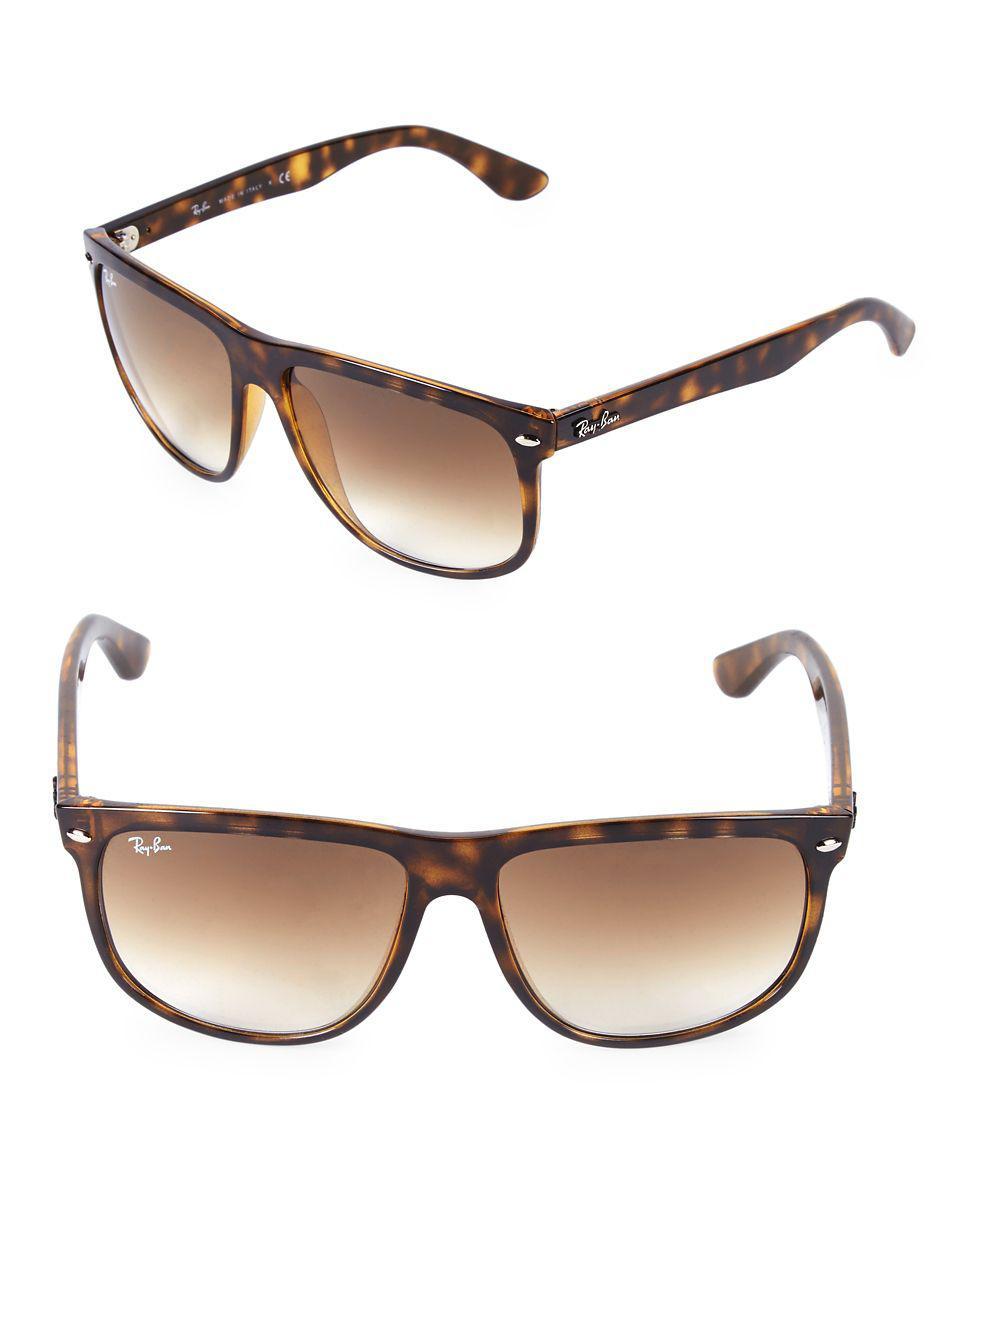 5b1b5709170 Lyst - Ray-Ban Flat Top Boyfriend Wayfarer Sunglasses in Brown for Men